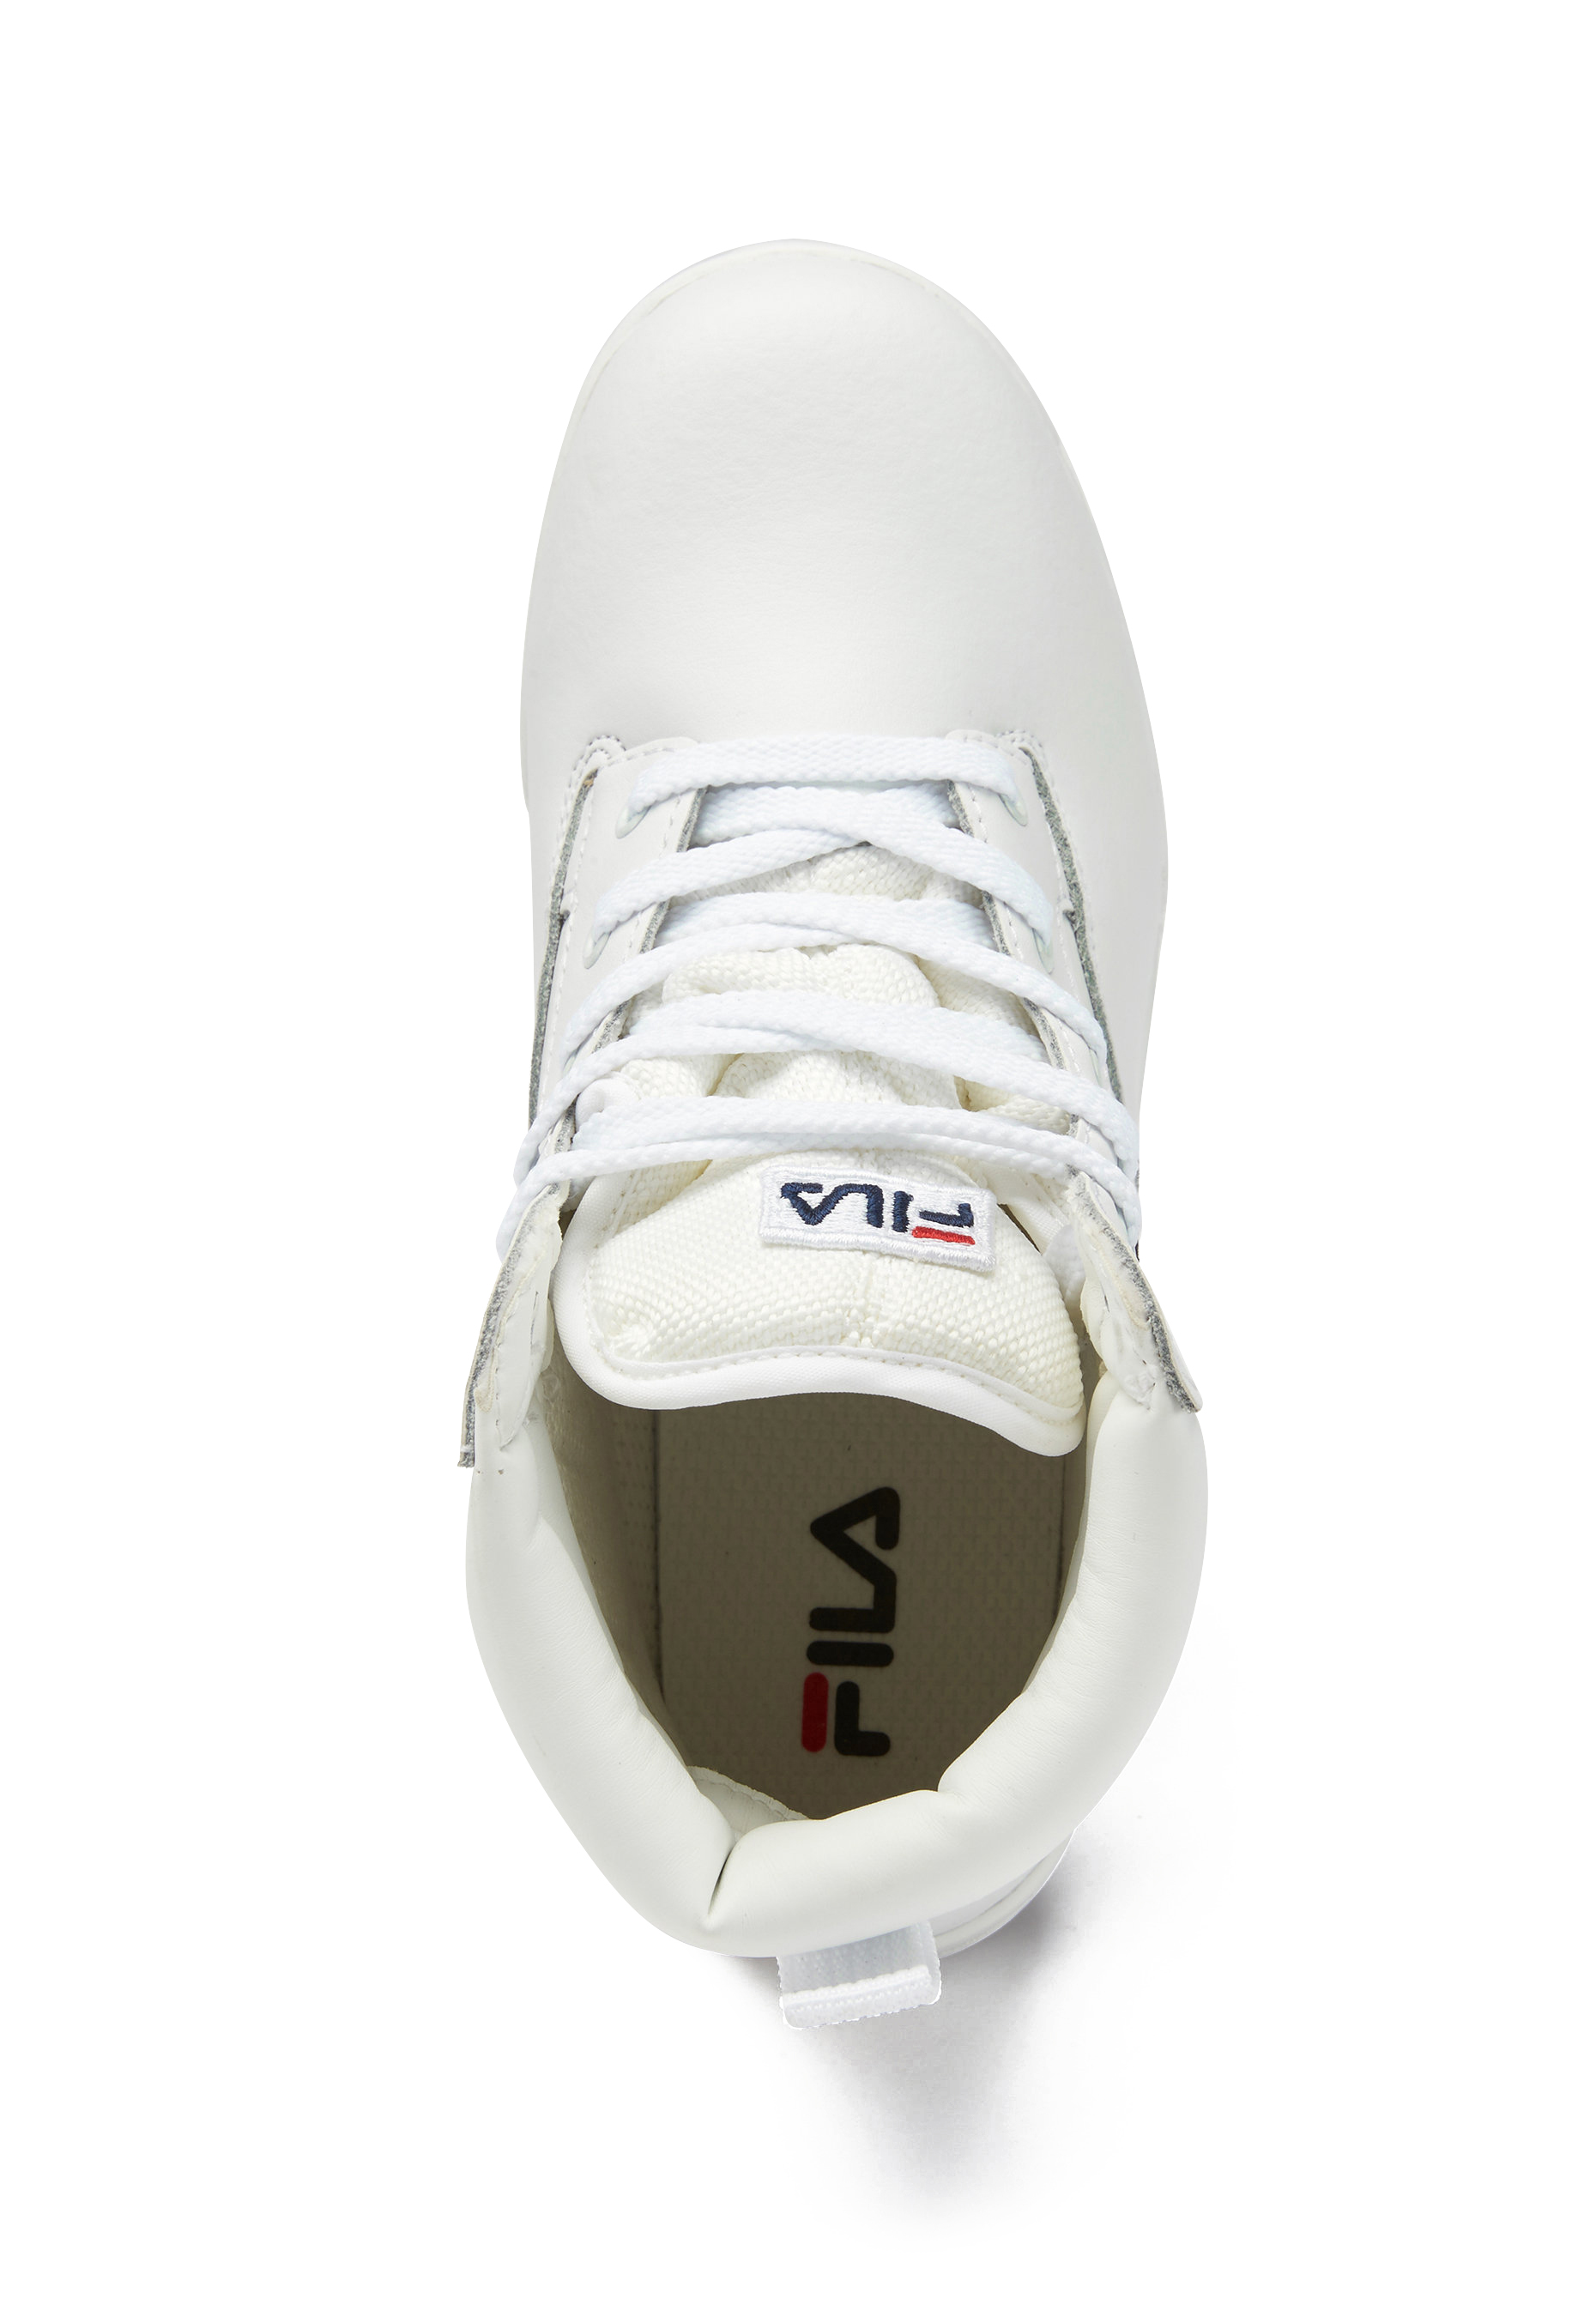 FILA Grunge Mid Boots White Bubbleroom